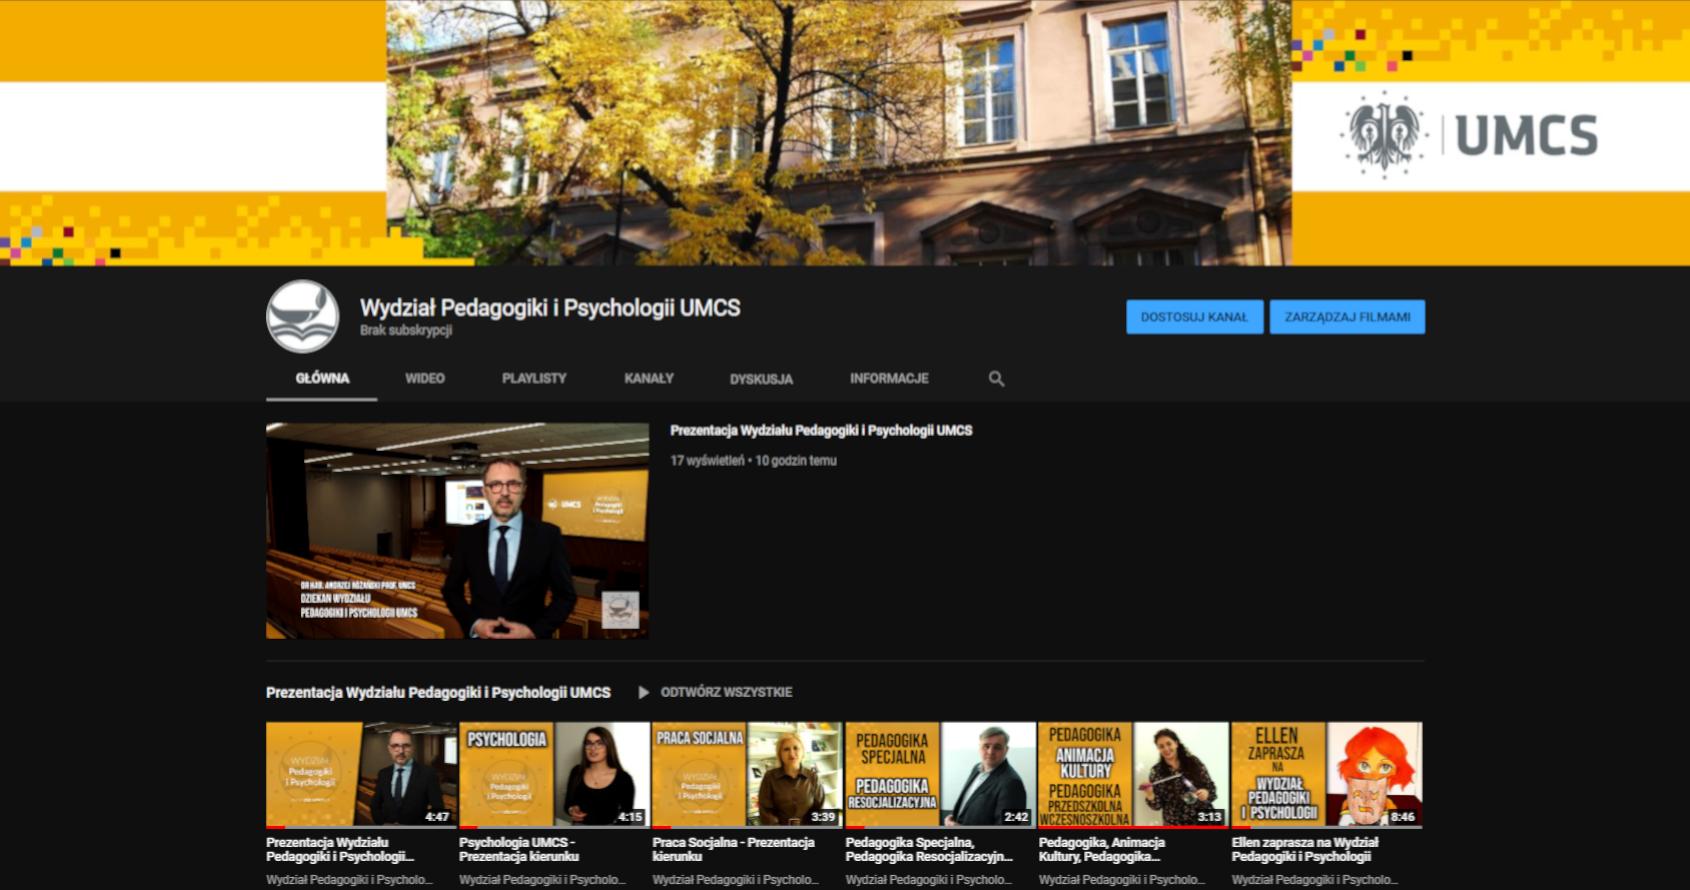 zdjecie na banner pedagogiki i psychologii strona UMCS.png